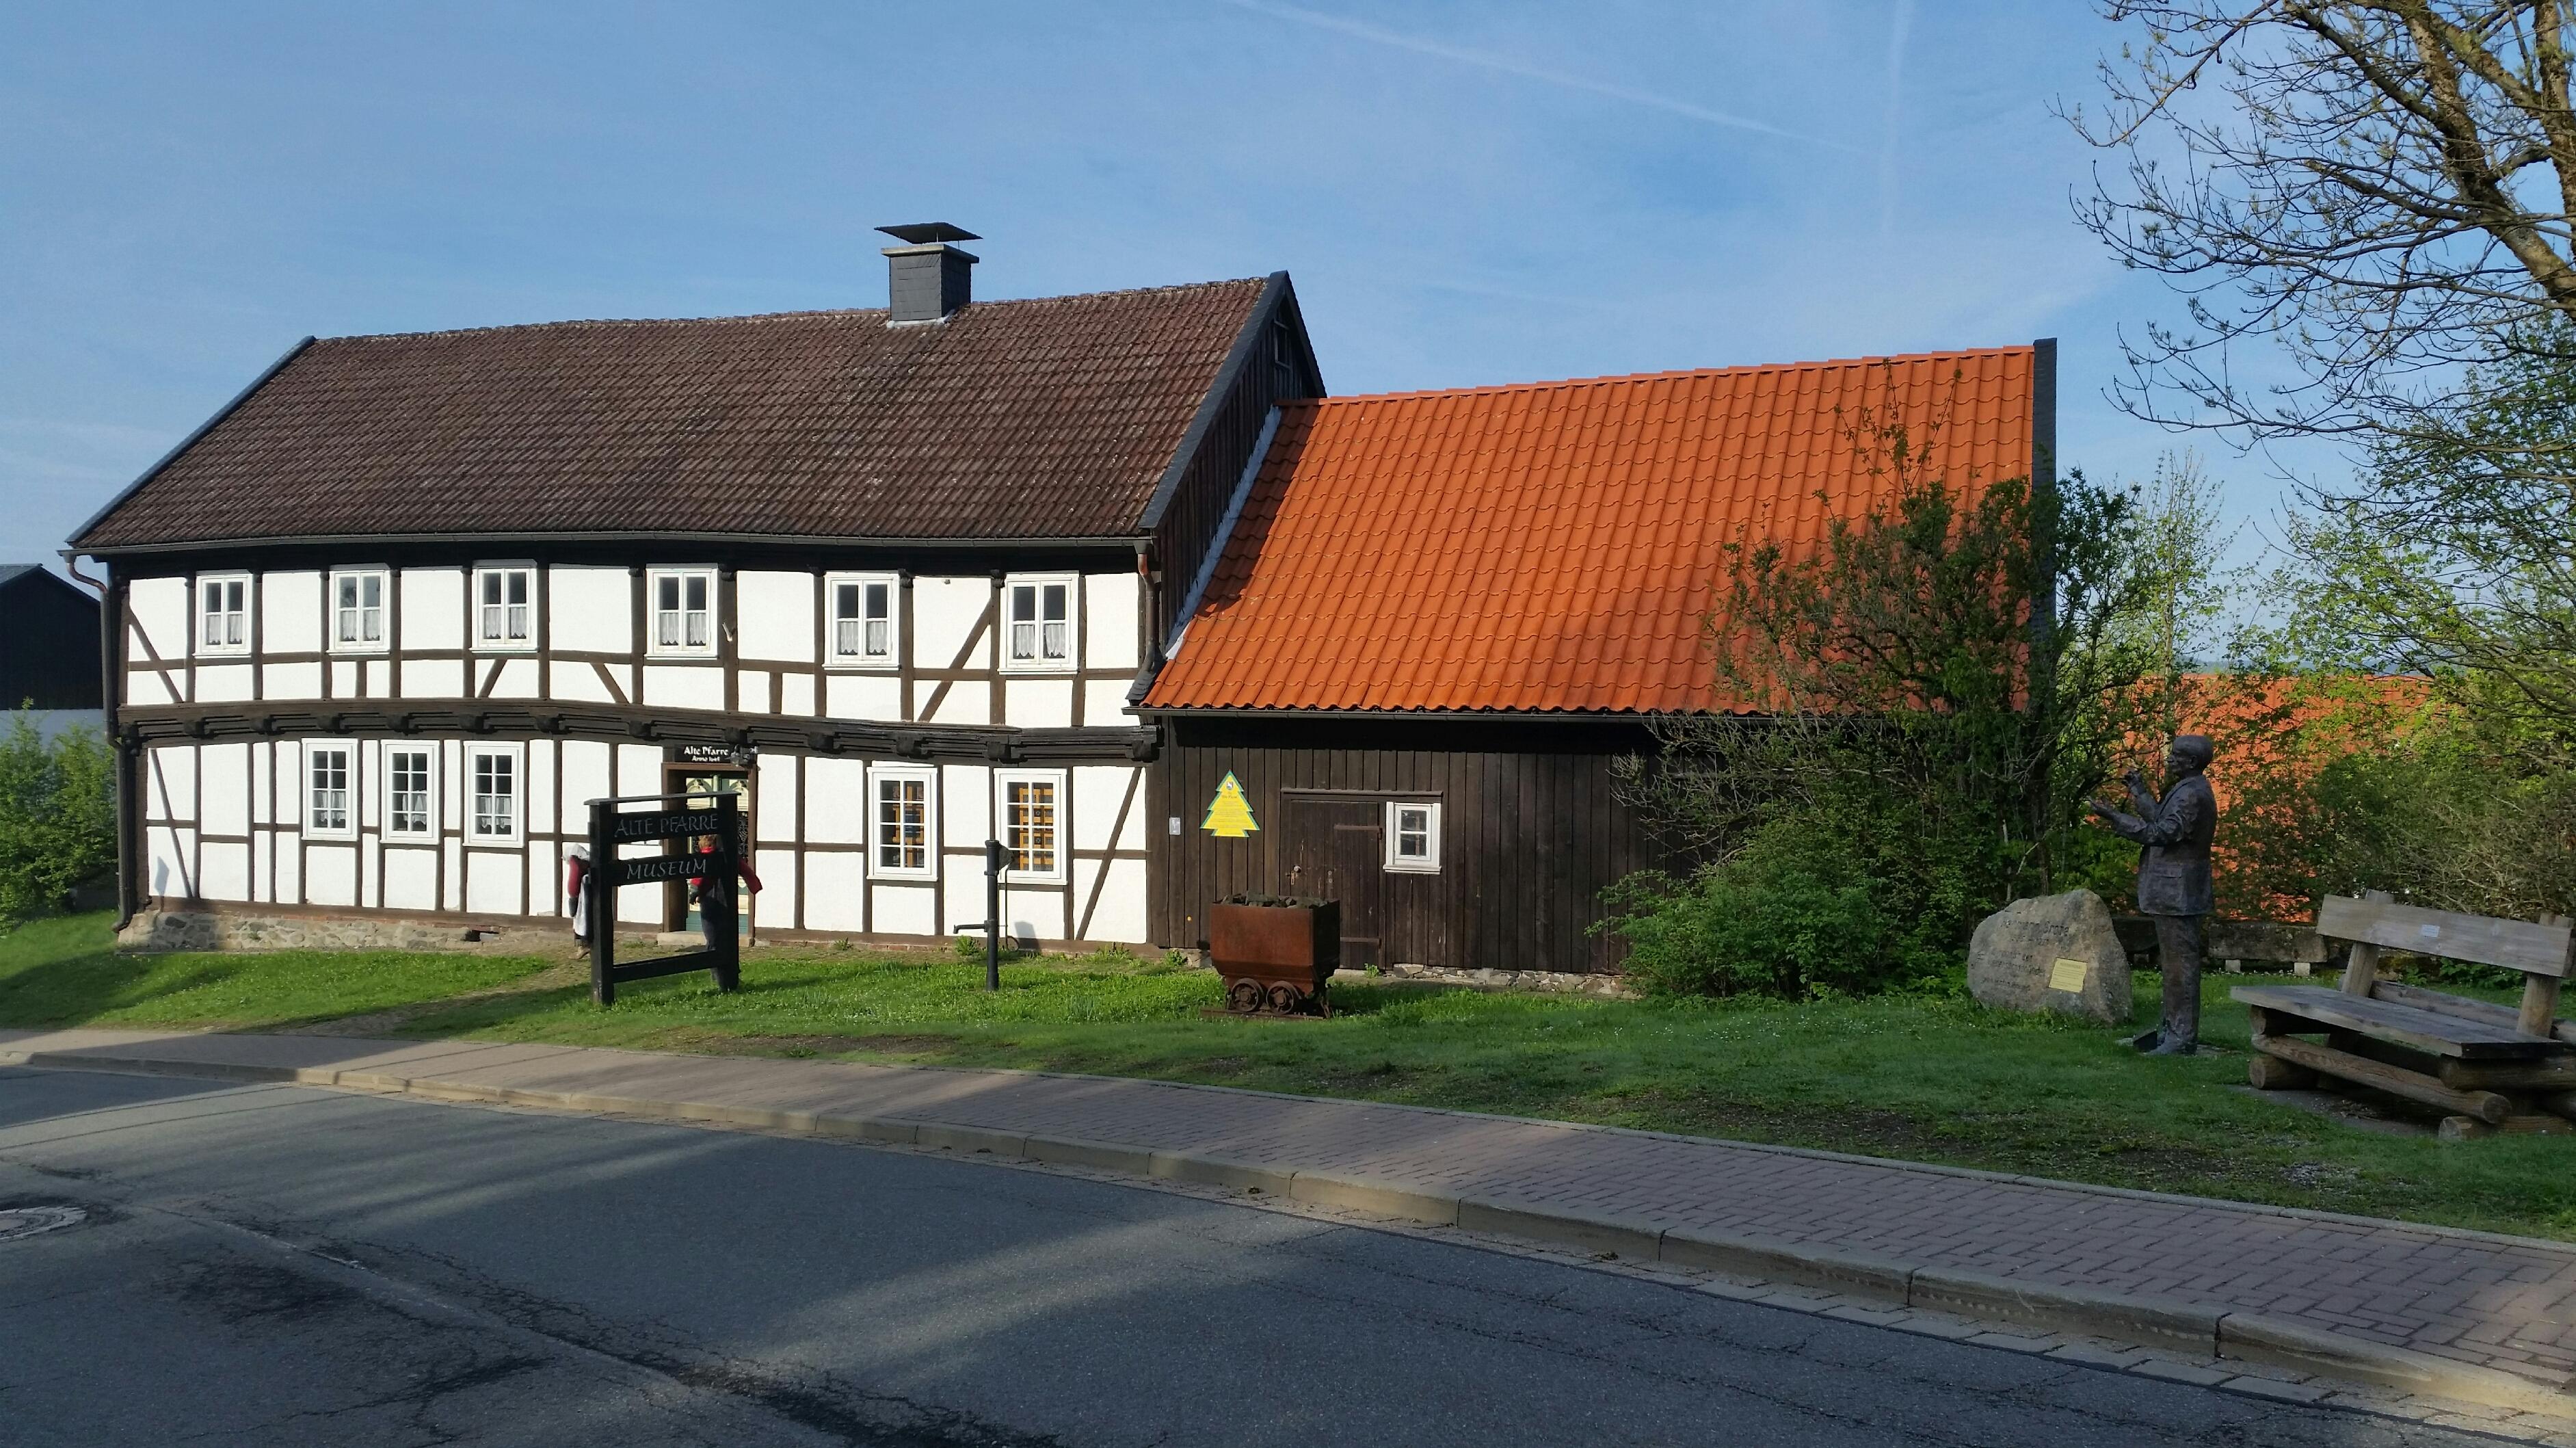 hohegeiß-heimatmuseum3(c)andreas-bartels.jpg